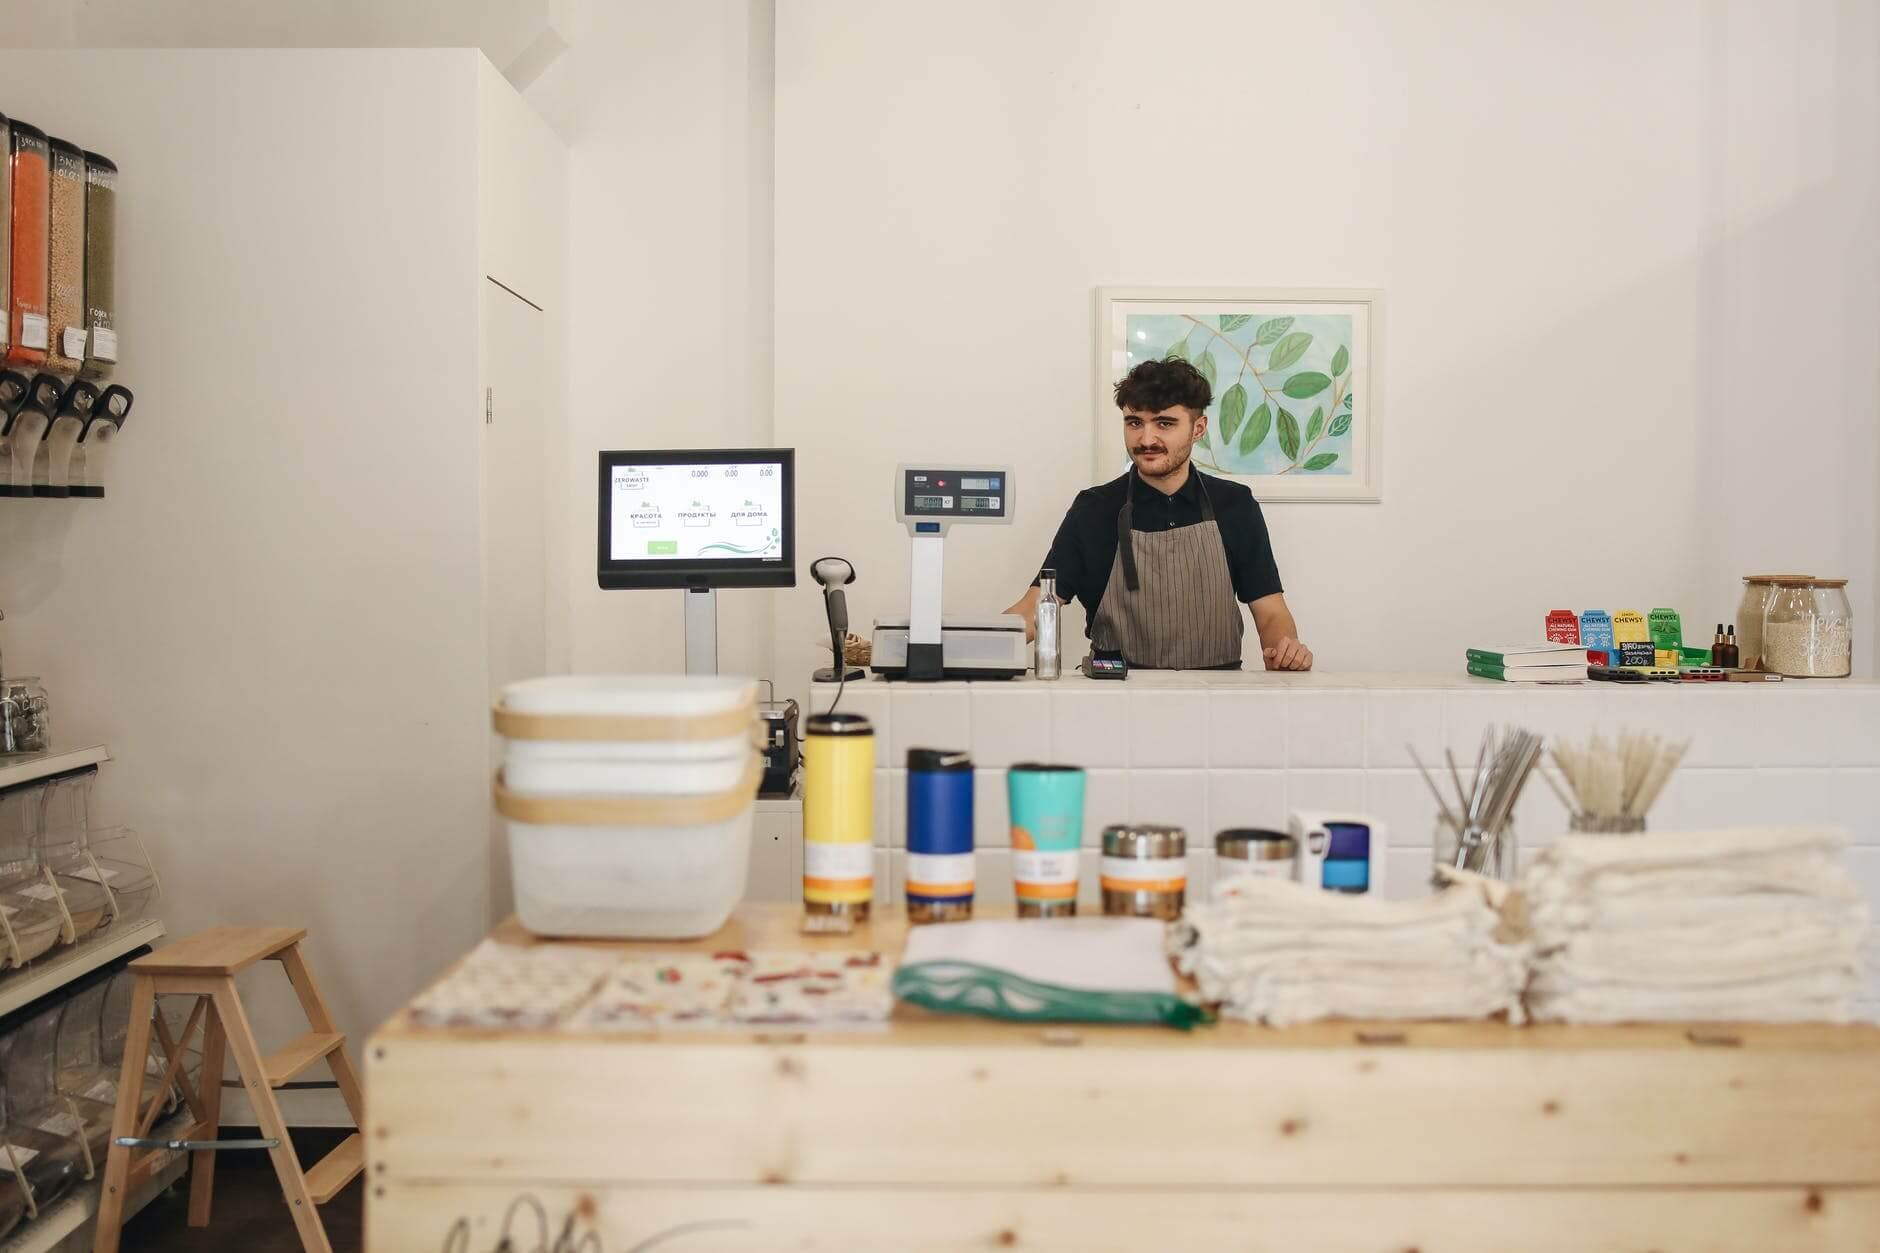 Pexels Shopkeeper